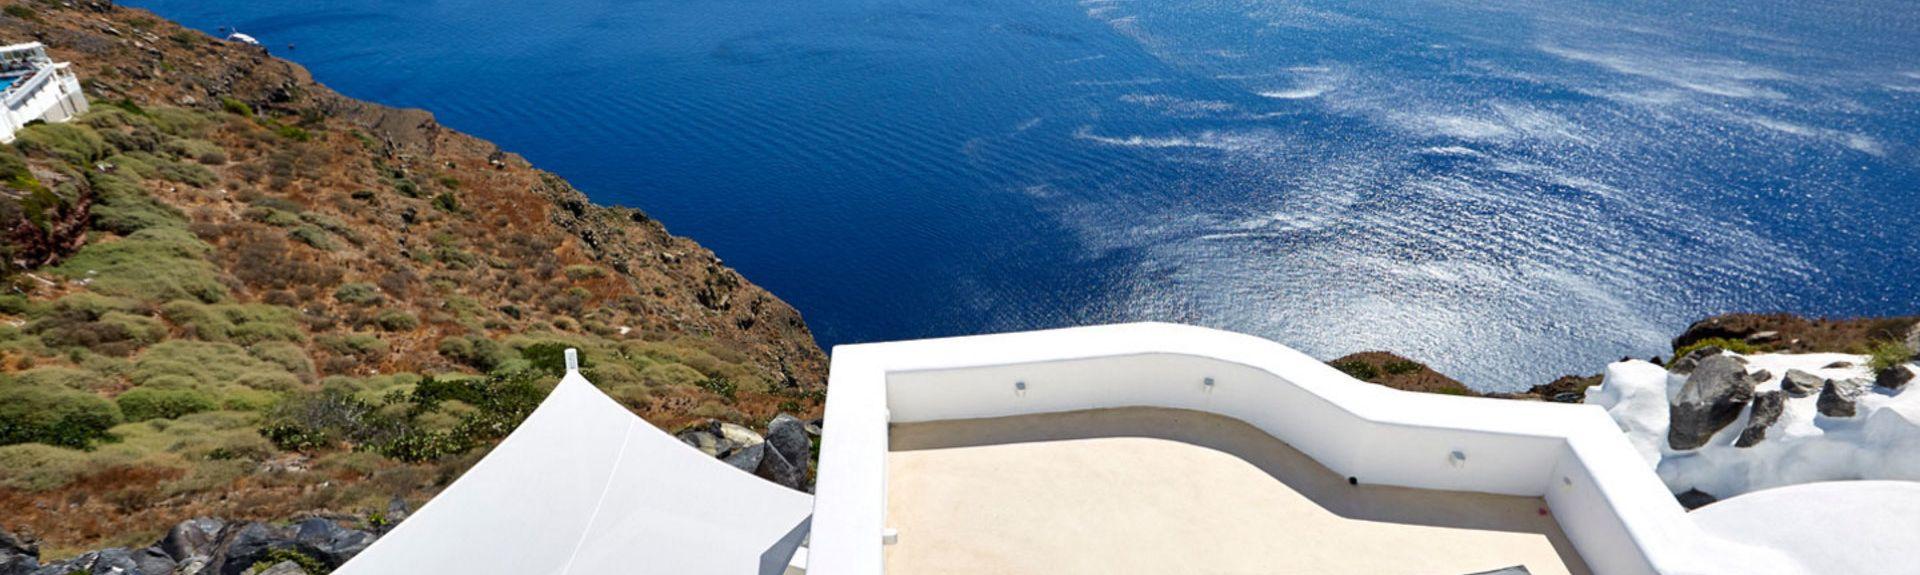 Petros M. Nomikos Conferencecenter, Fira, De Ægæiske Øer, Grækenland